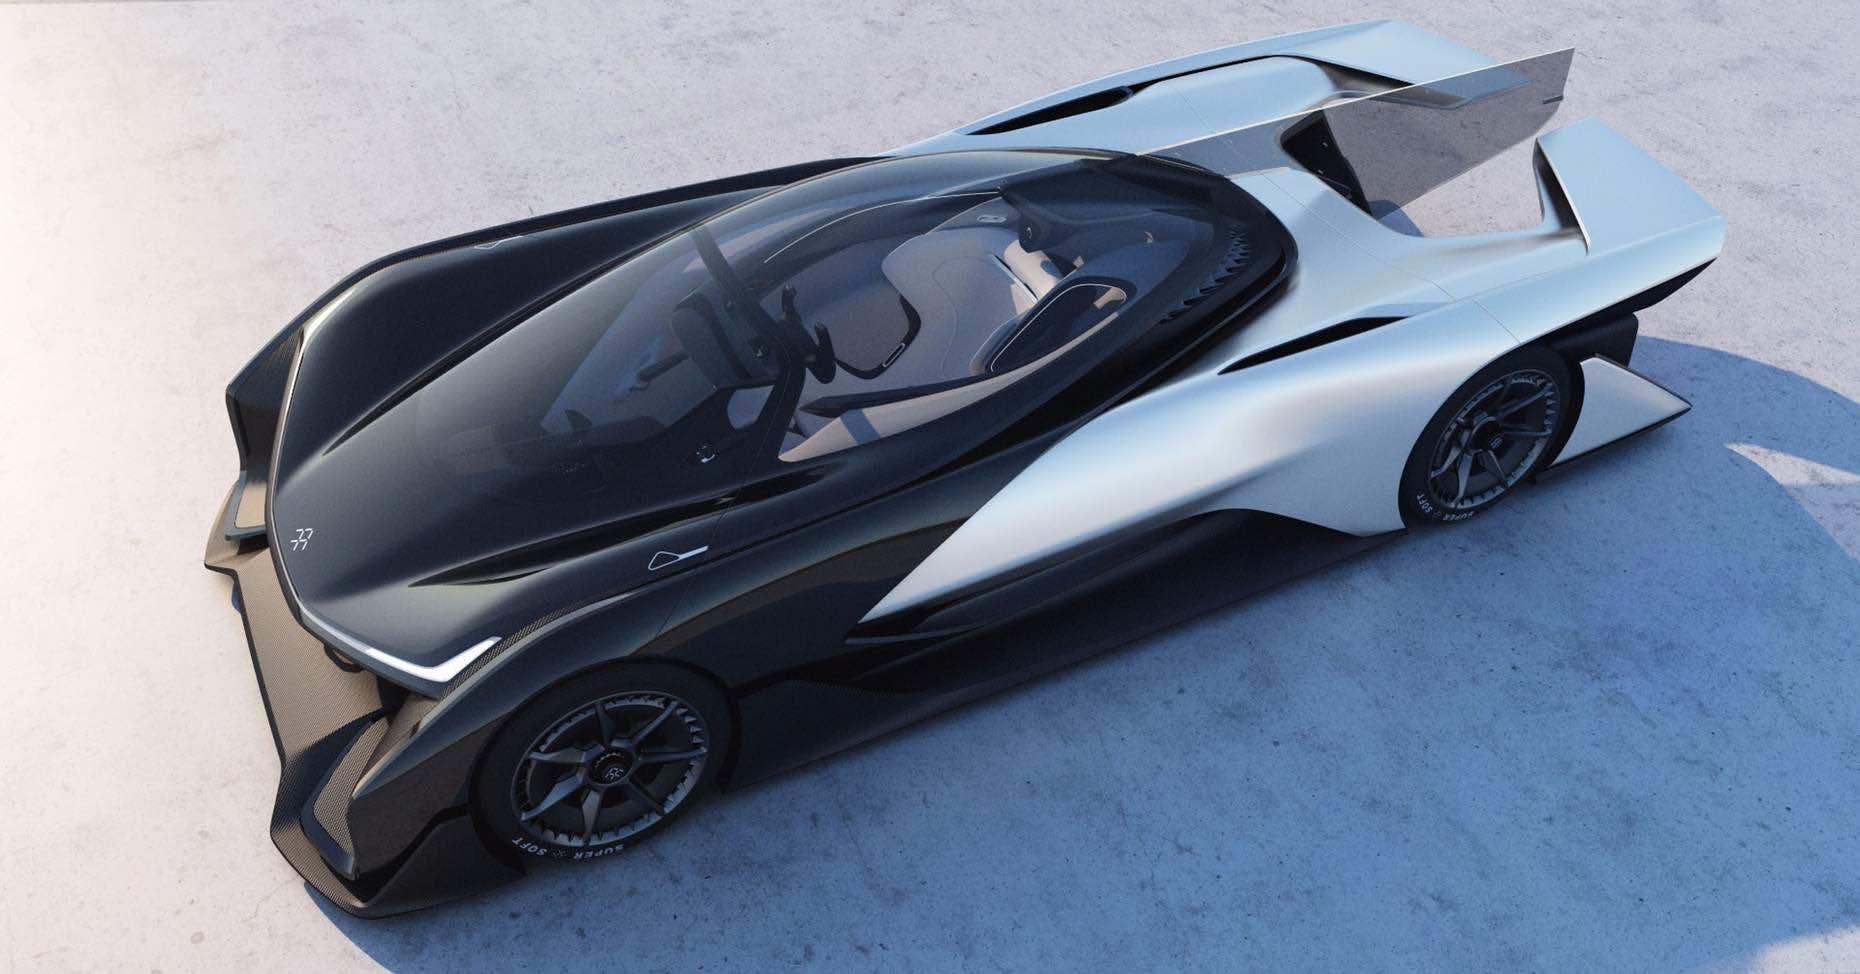 Faraday Future Unveils FFZERO1 Concept At CES 2016